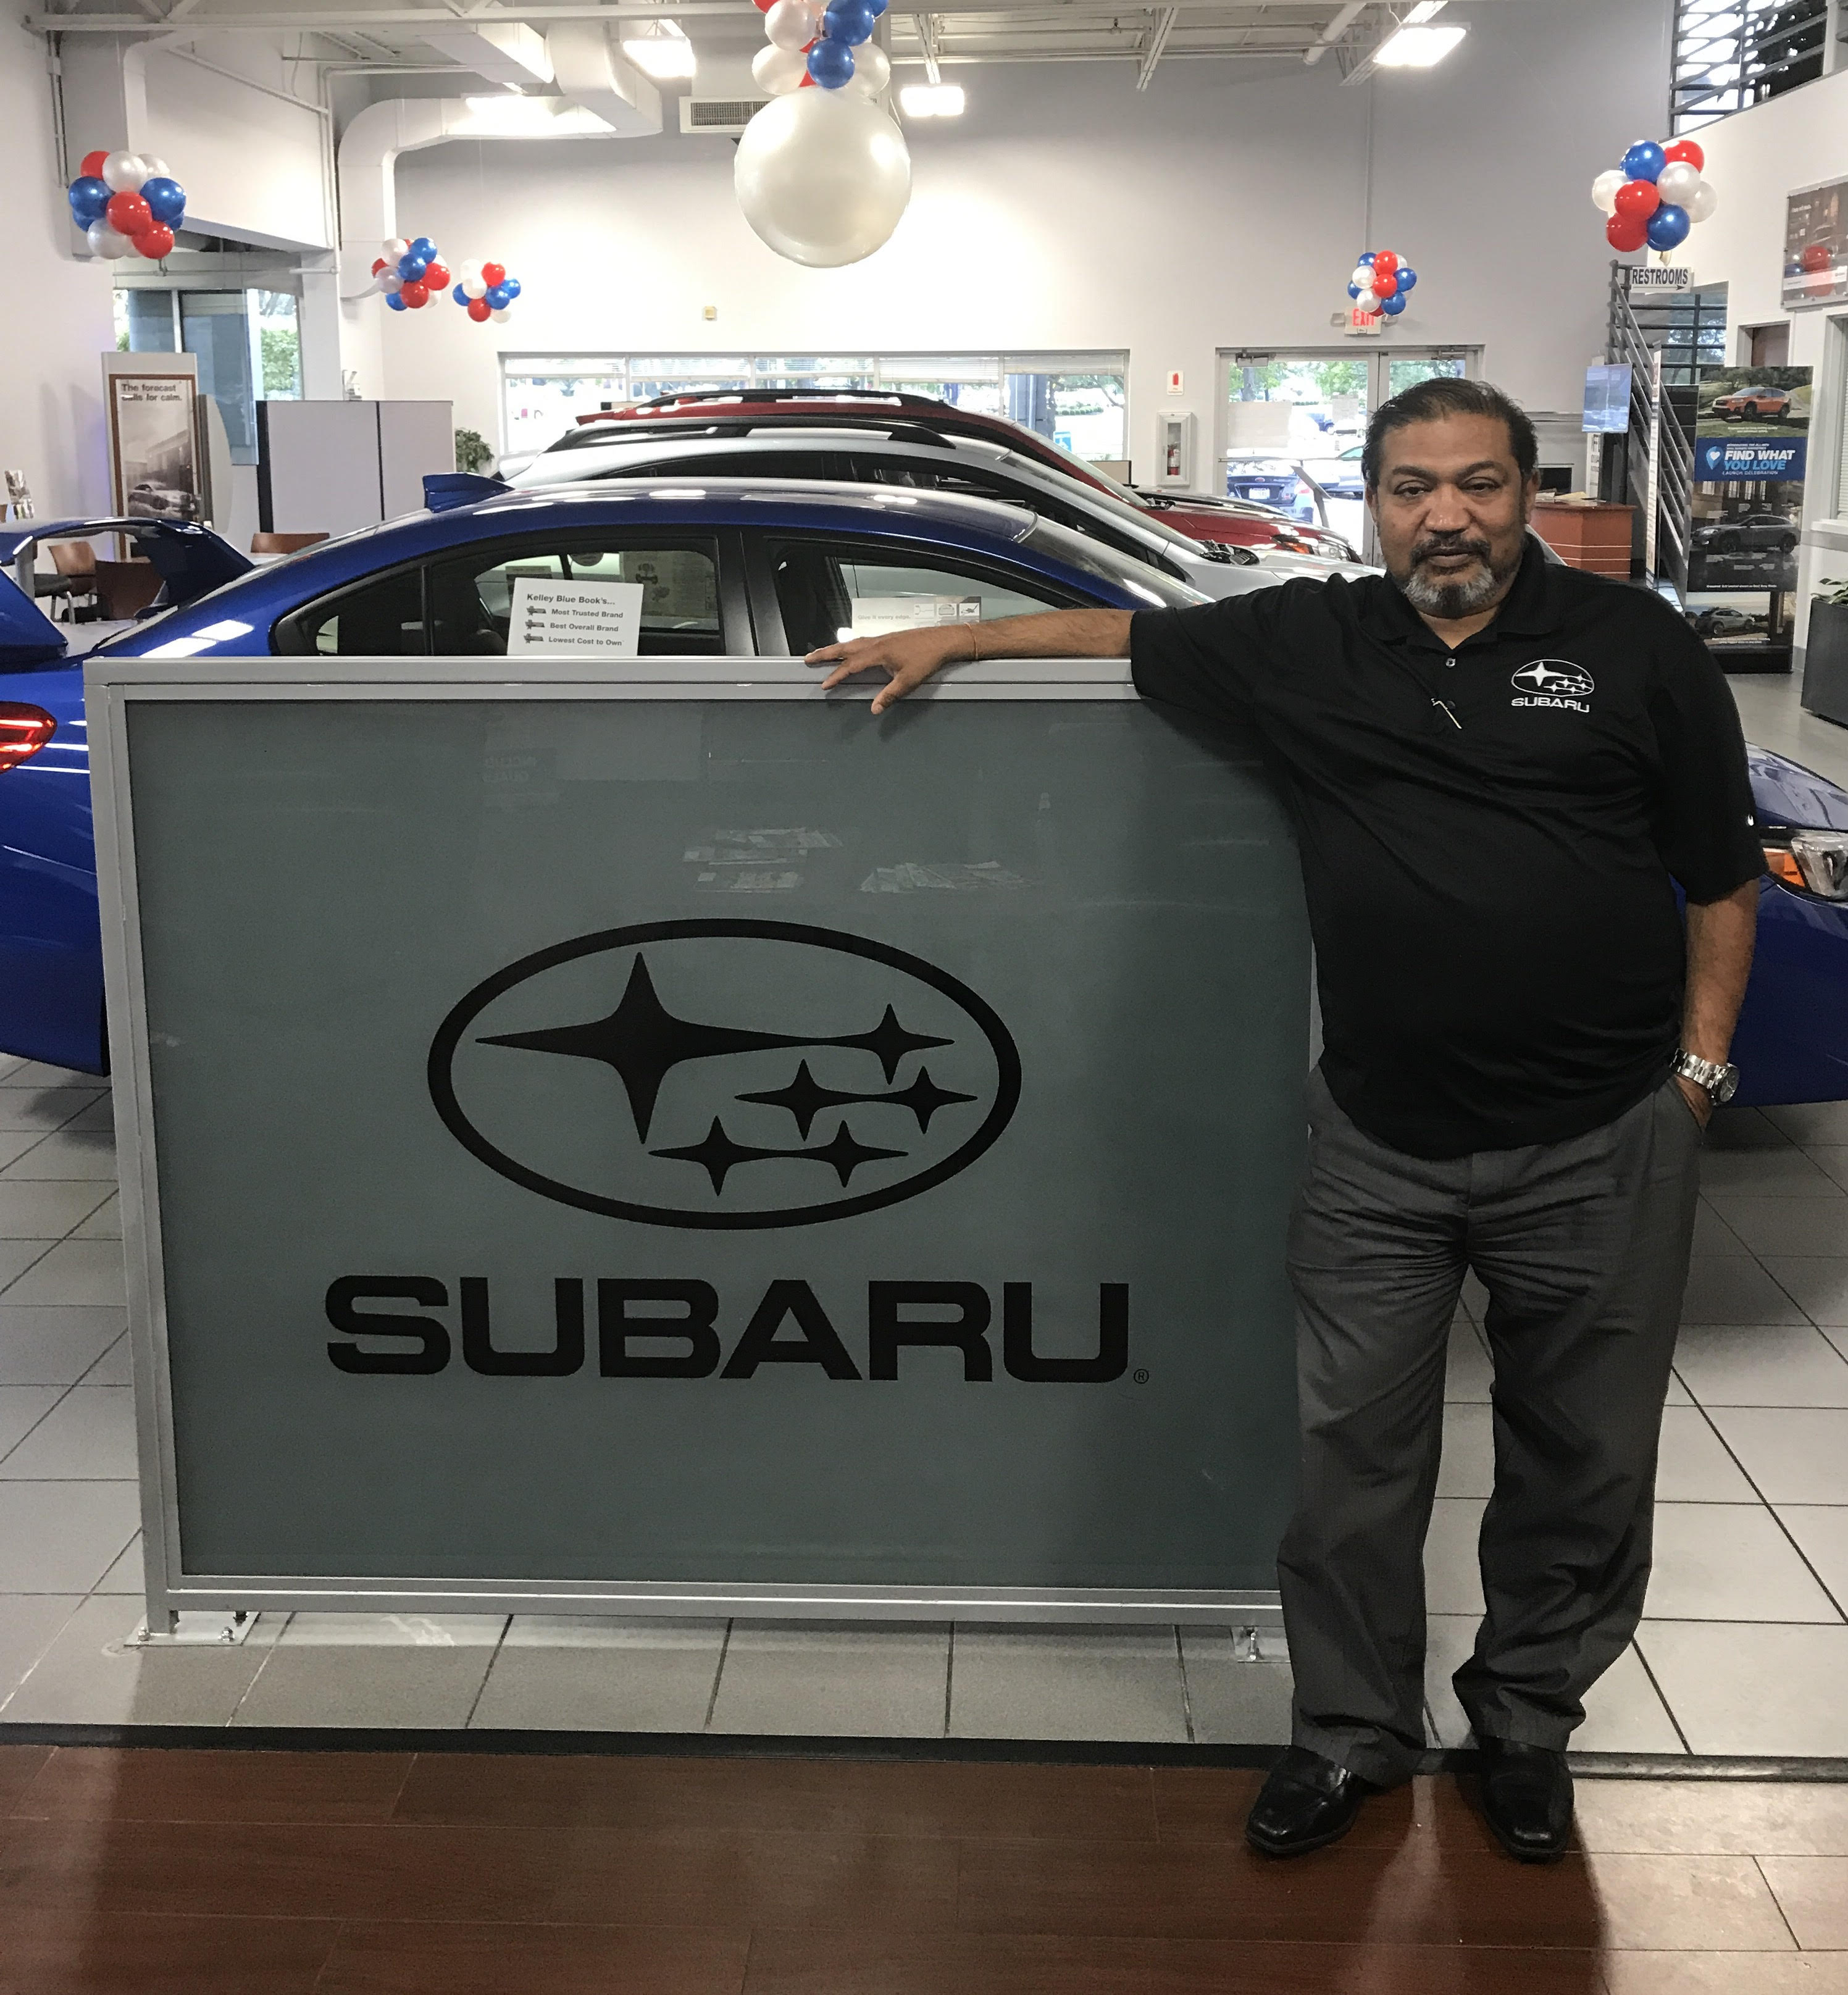 Subaru Of Dayton >> Subaru Loans Leases In Dayton Subaru Financing At Subaru Of Dayton